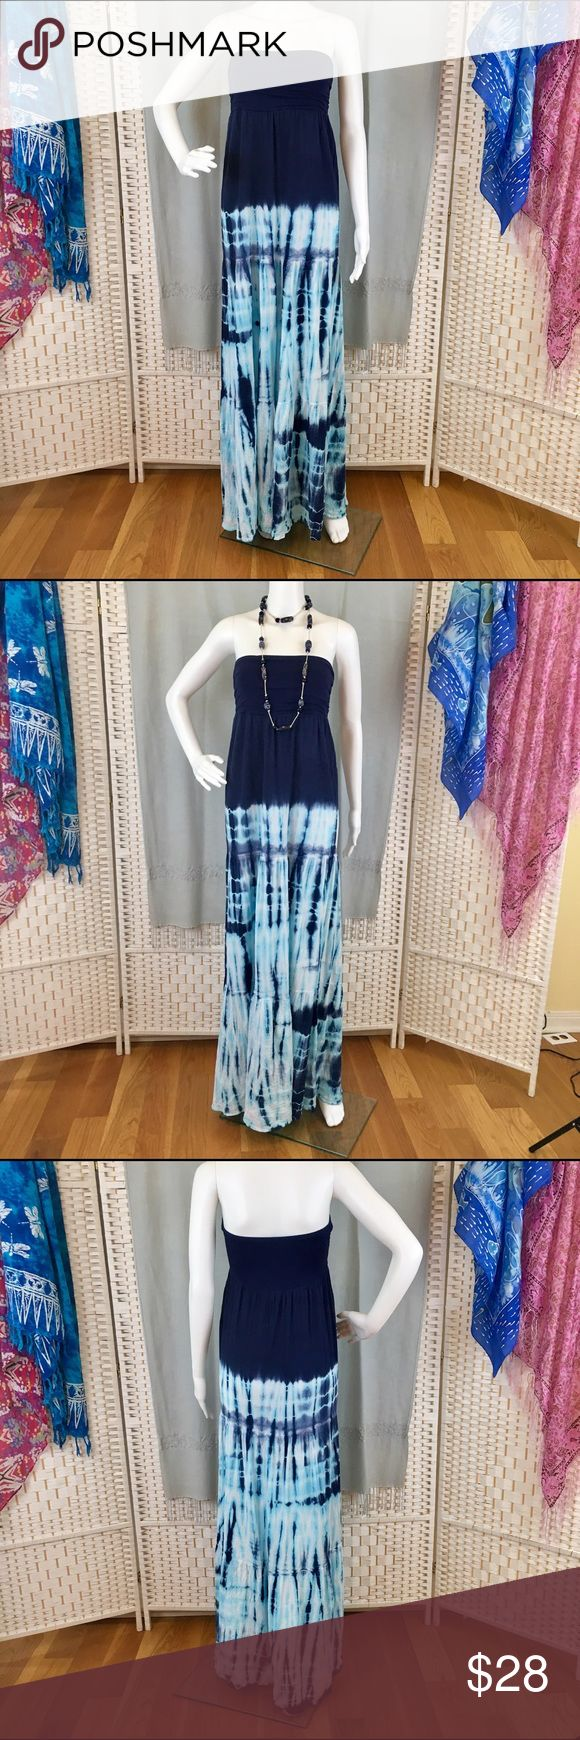 Chatoyant Tie Dye Maxi Dress Easy slip on maxi dress. Navy blue at top, aqua blue tie dye below. Worn once. EUC, Chatoyant Dresses Maxi